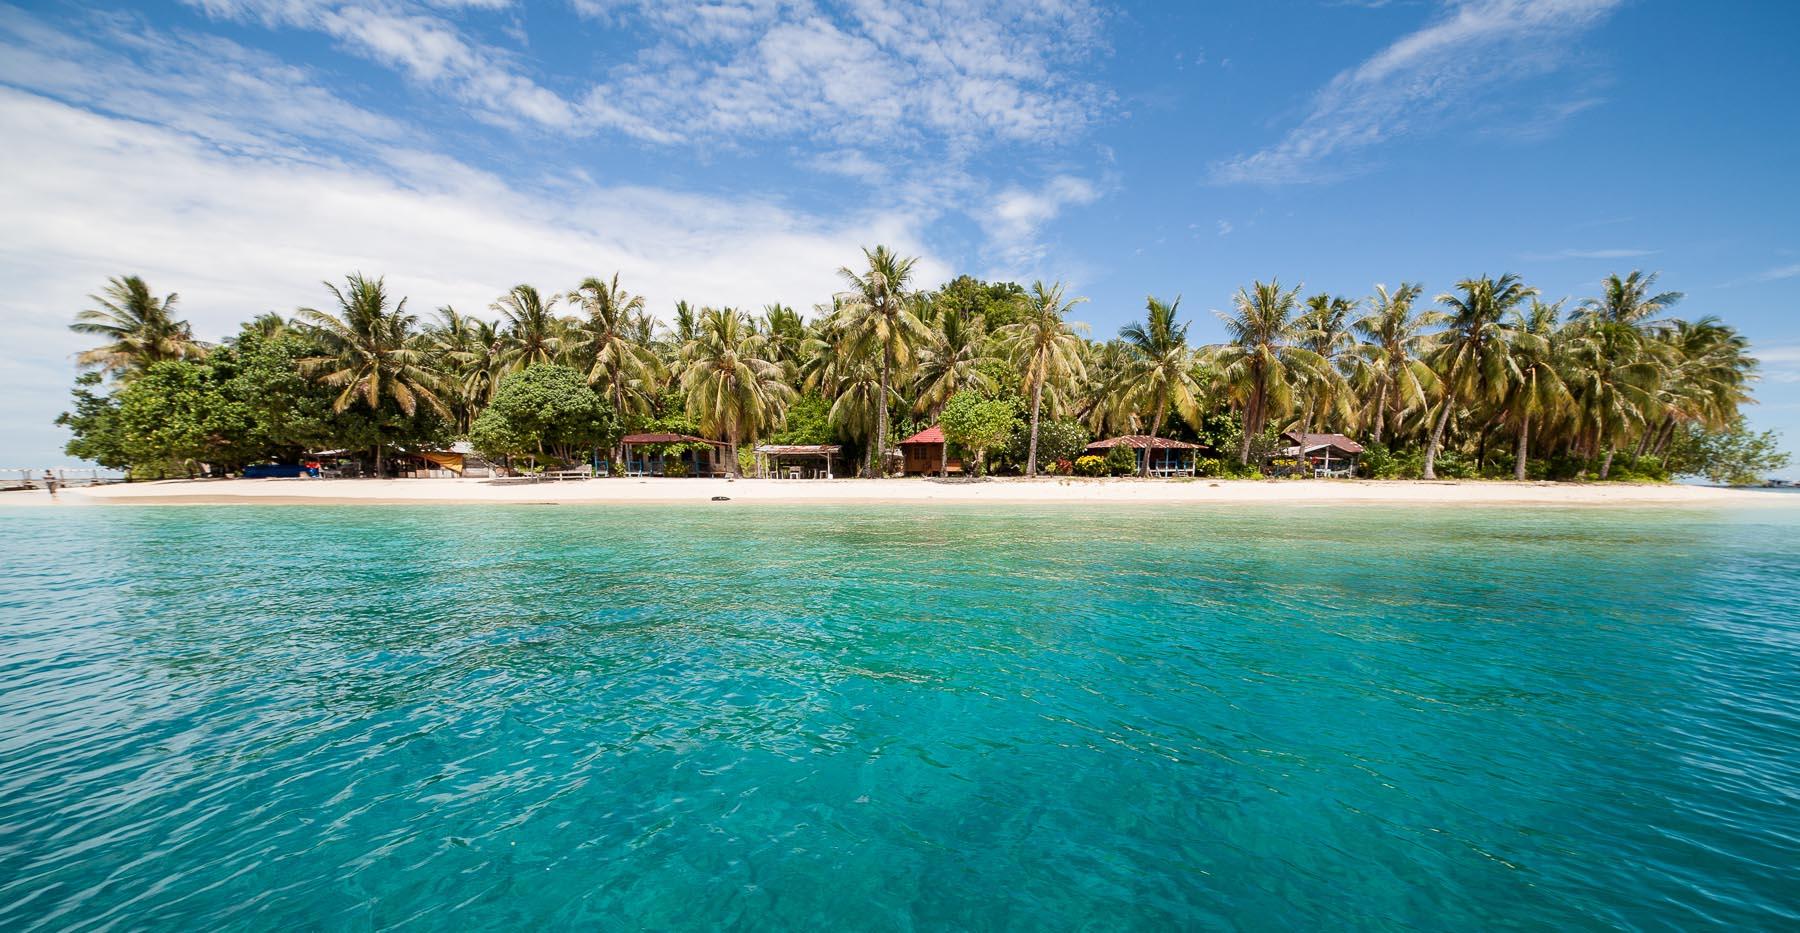 Fajar Nurdiansyah Pagang Island